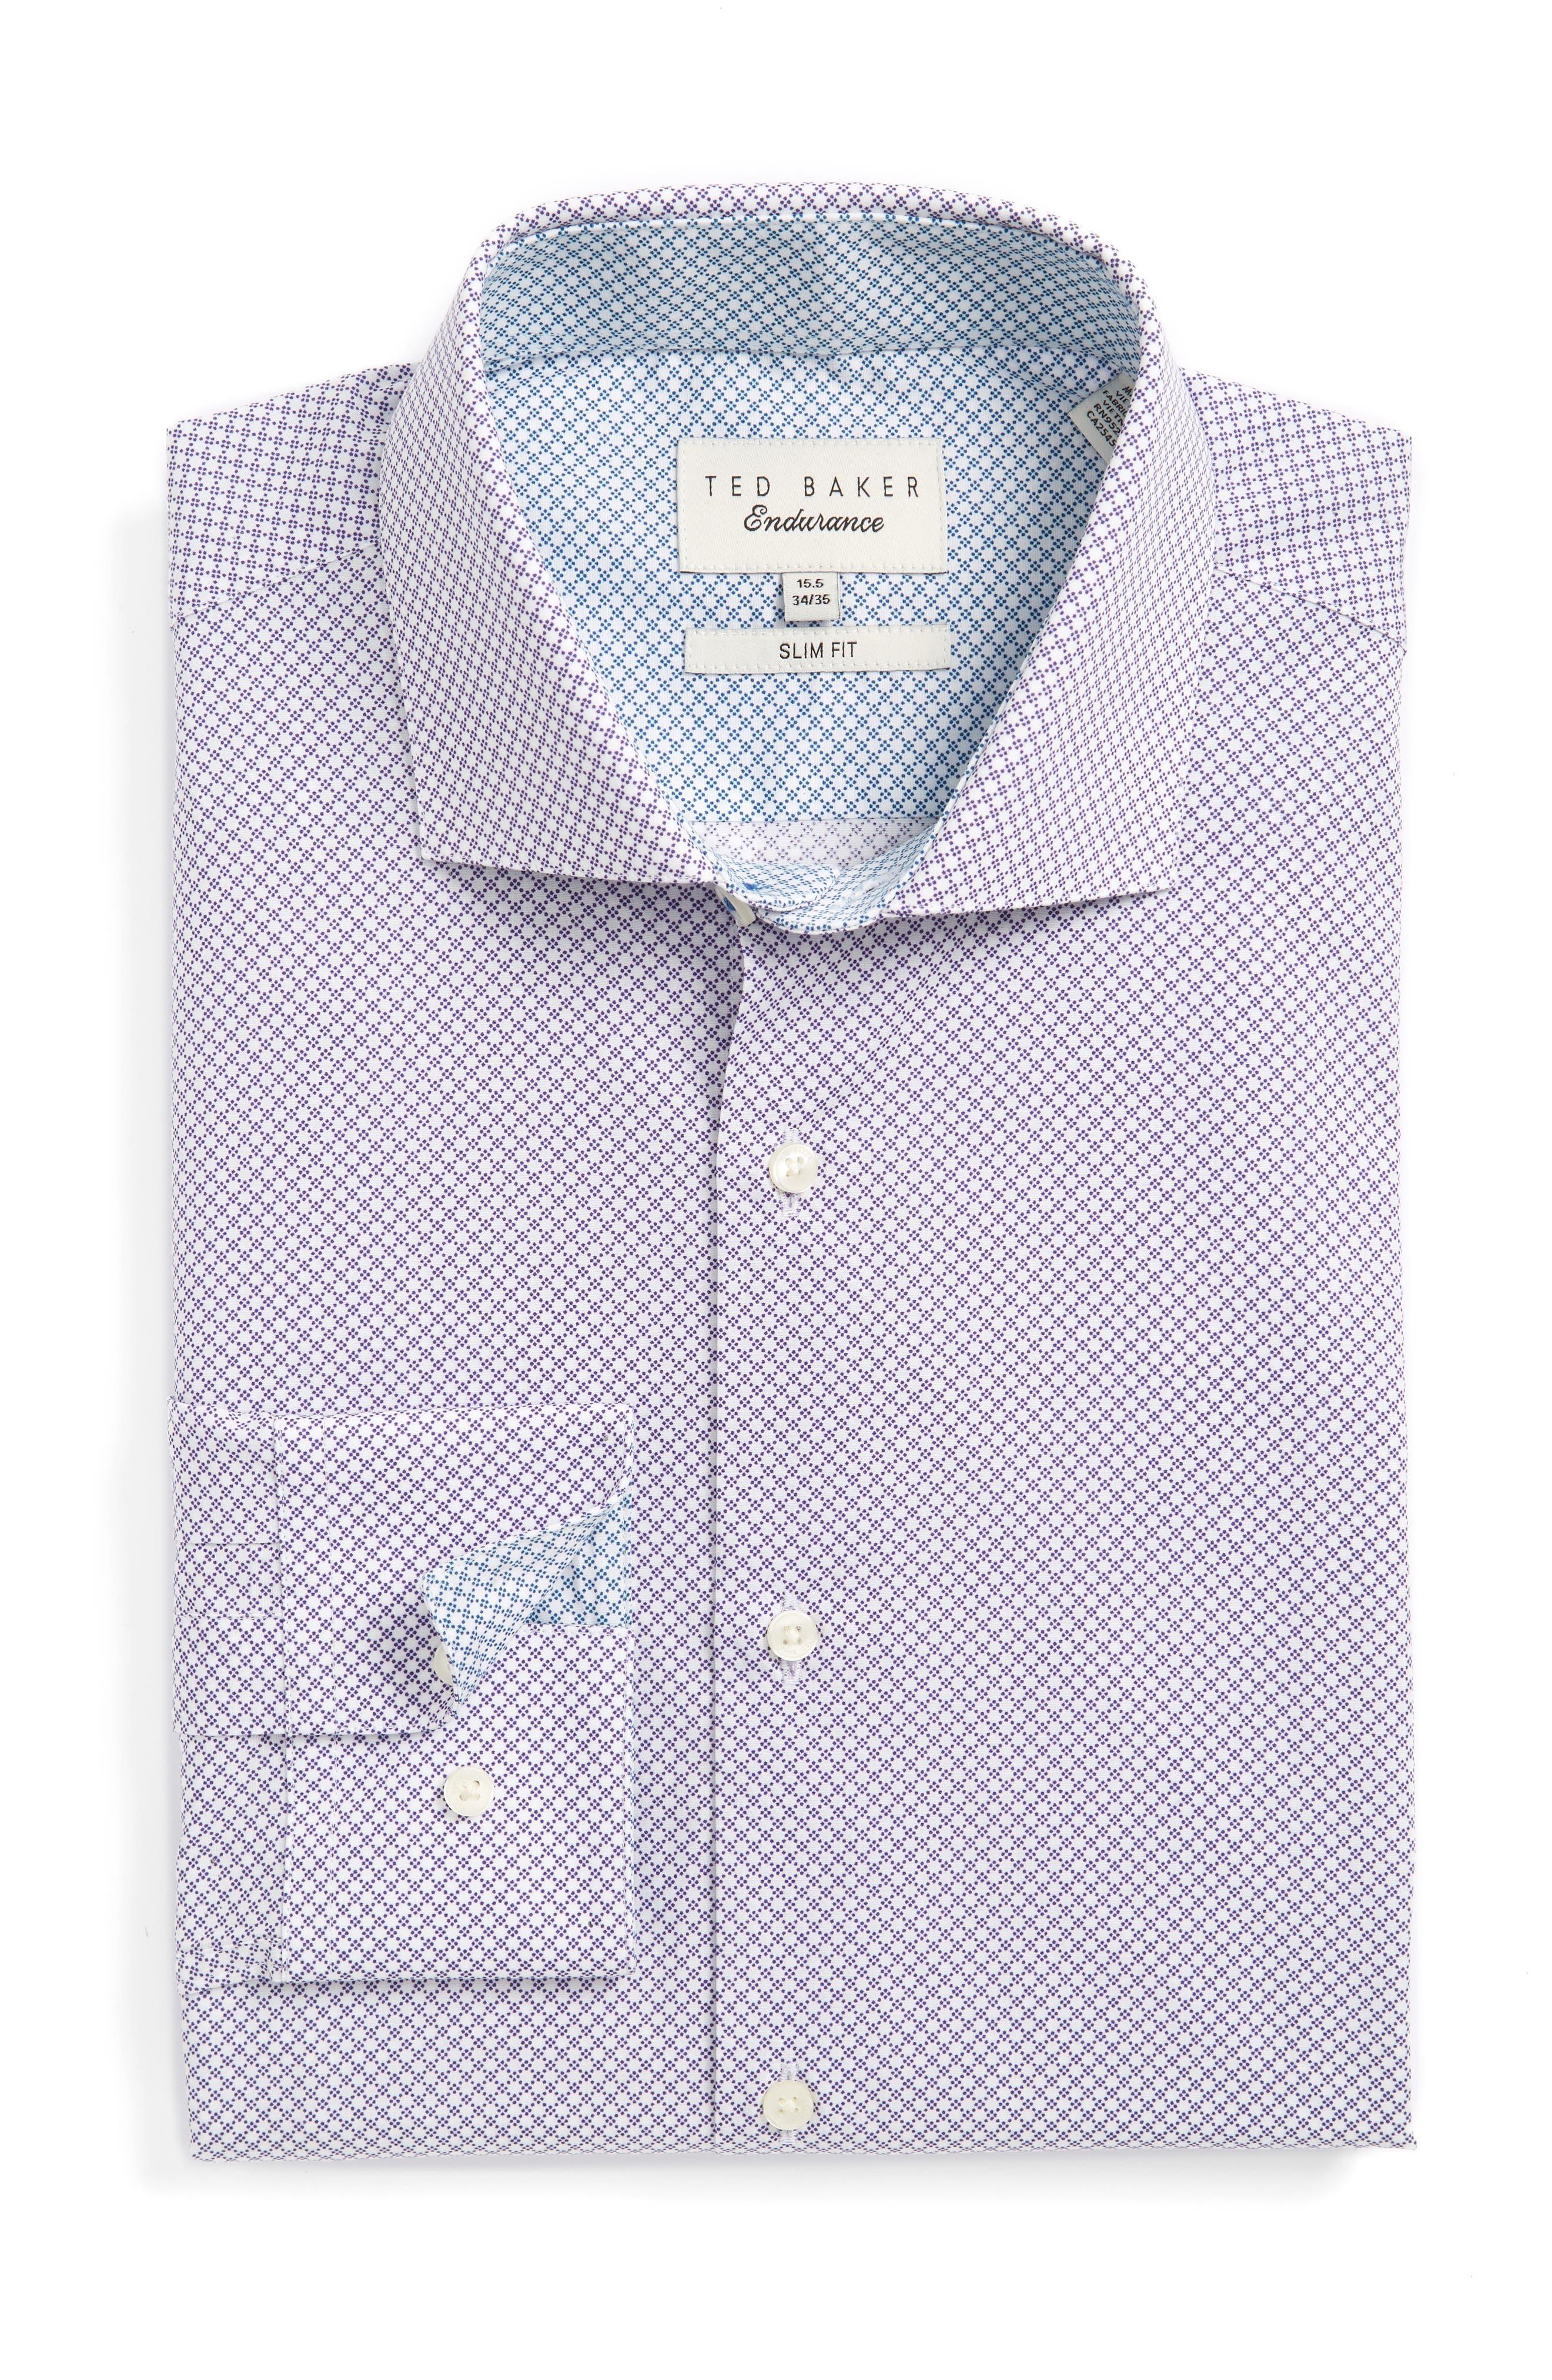 Ted Baker London Locket Slim Fit Geometric Dress Shirt